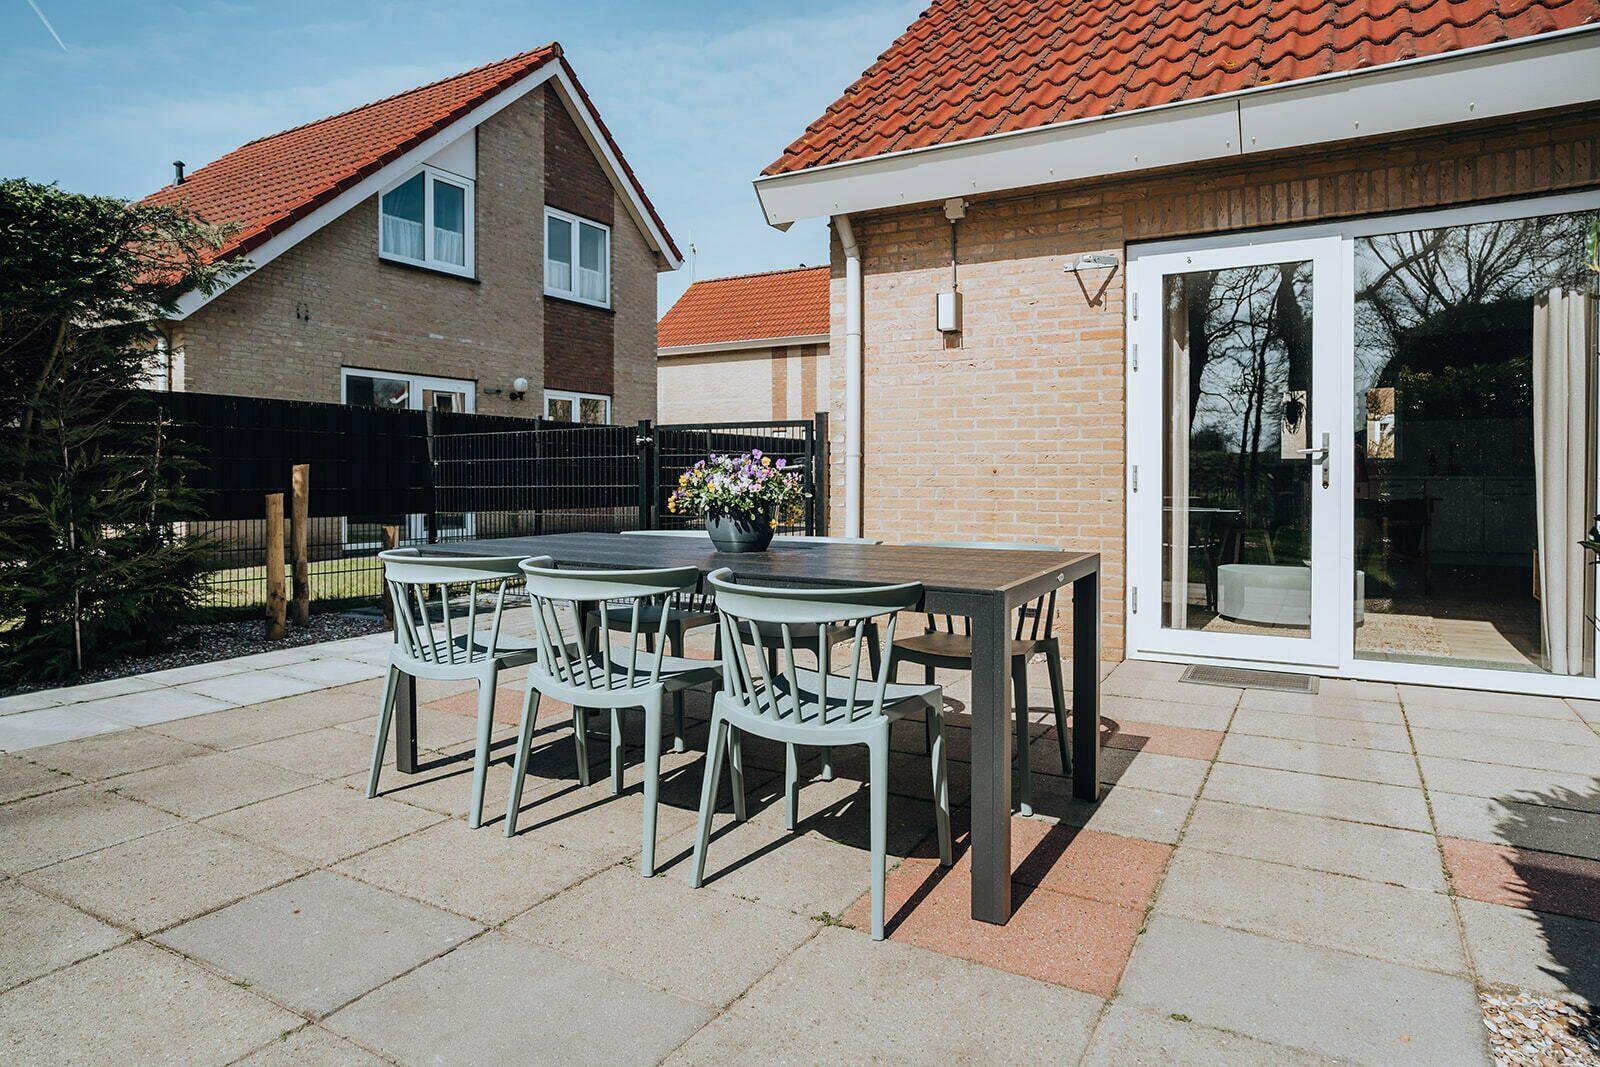 Mosselbank 081 - Noordzeepark Ouddorp